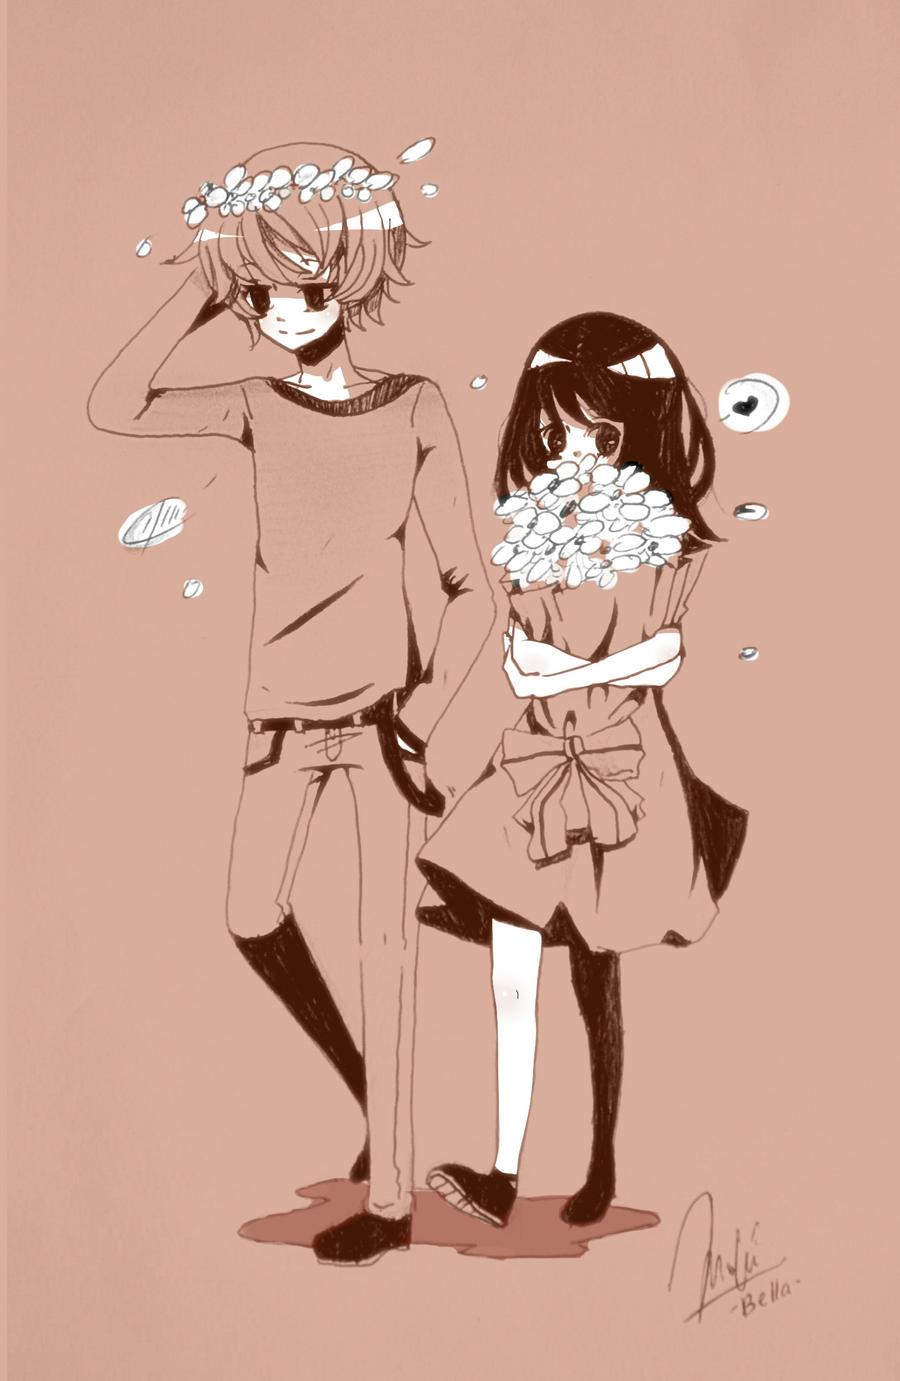 Daisies by Otromeru